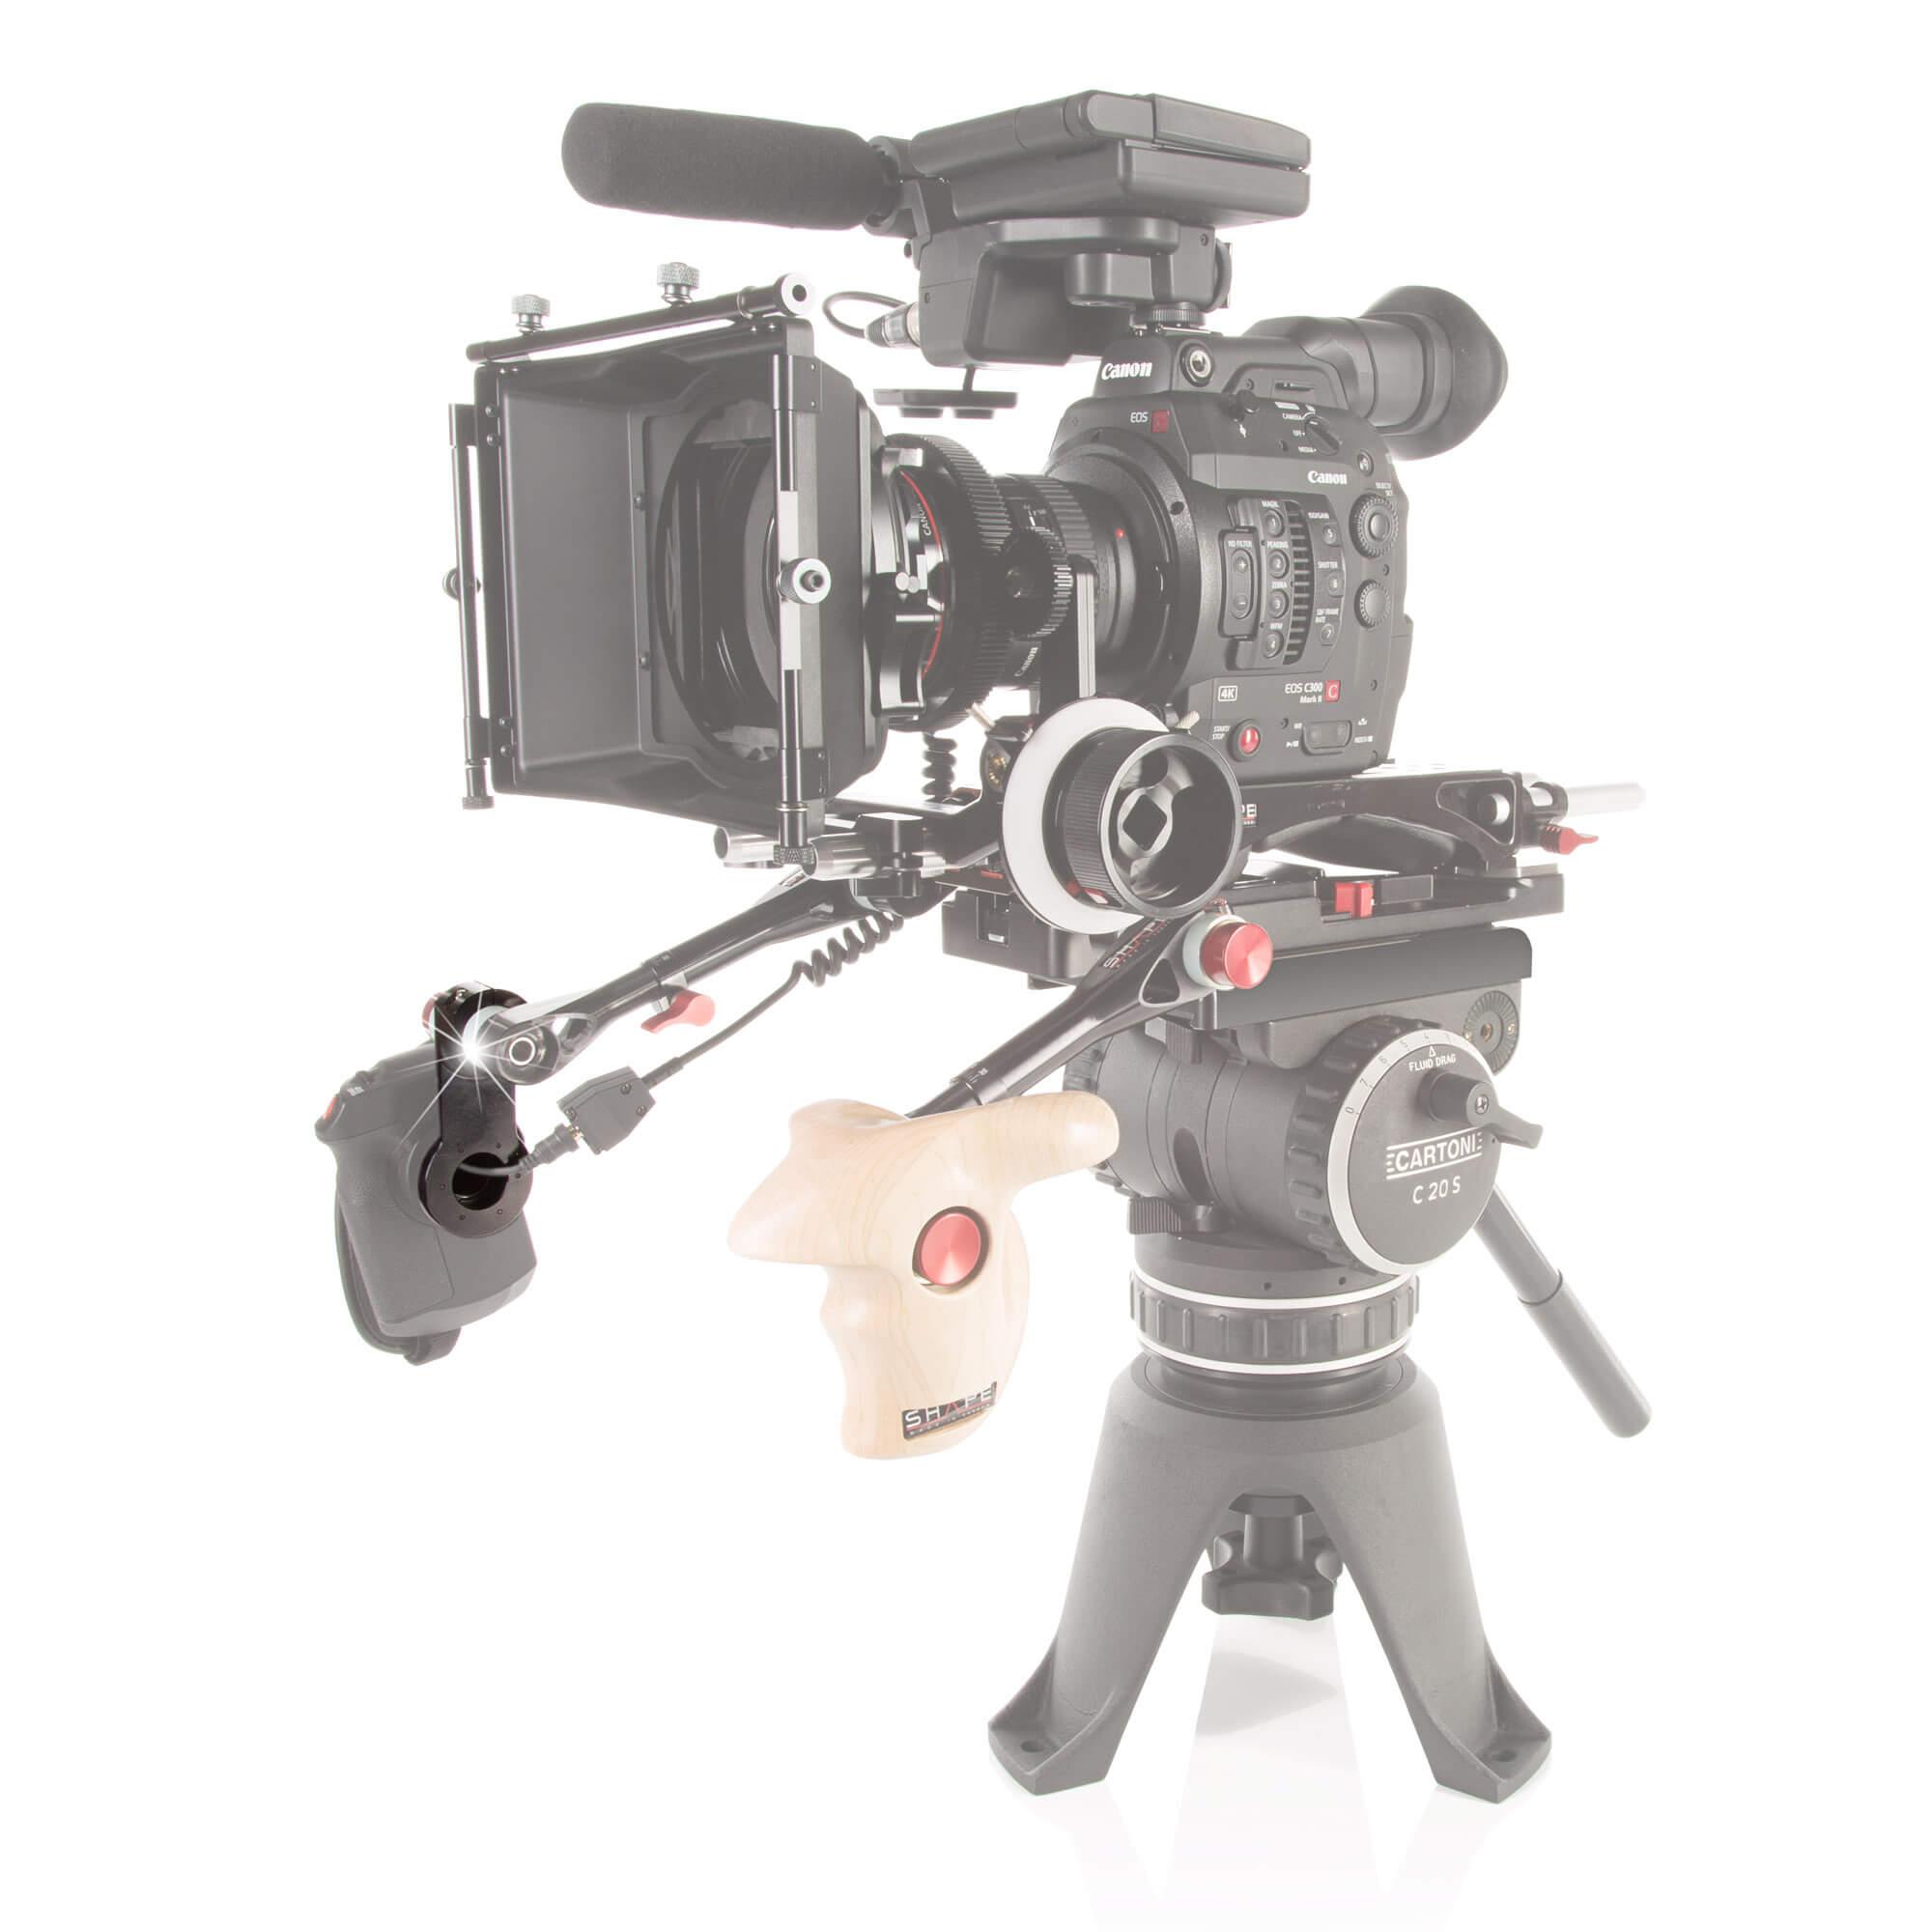 Shape C300 Bracket for the C300 Handle